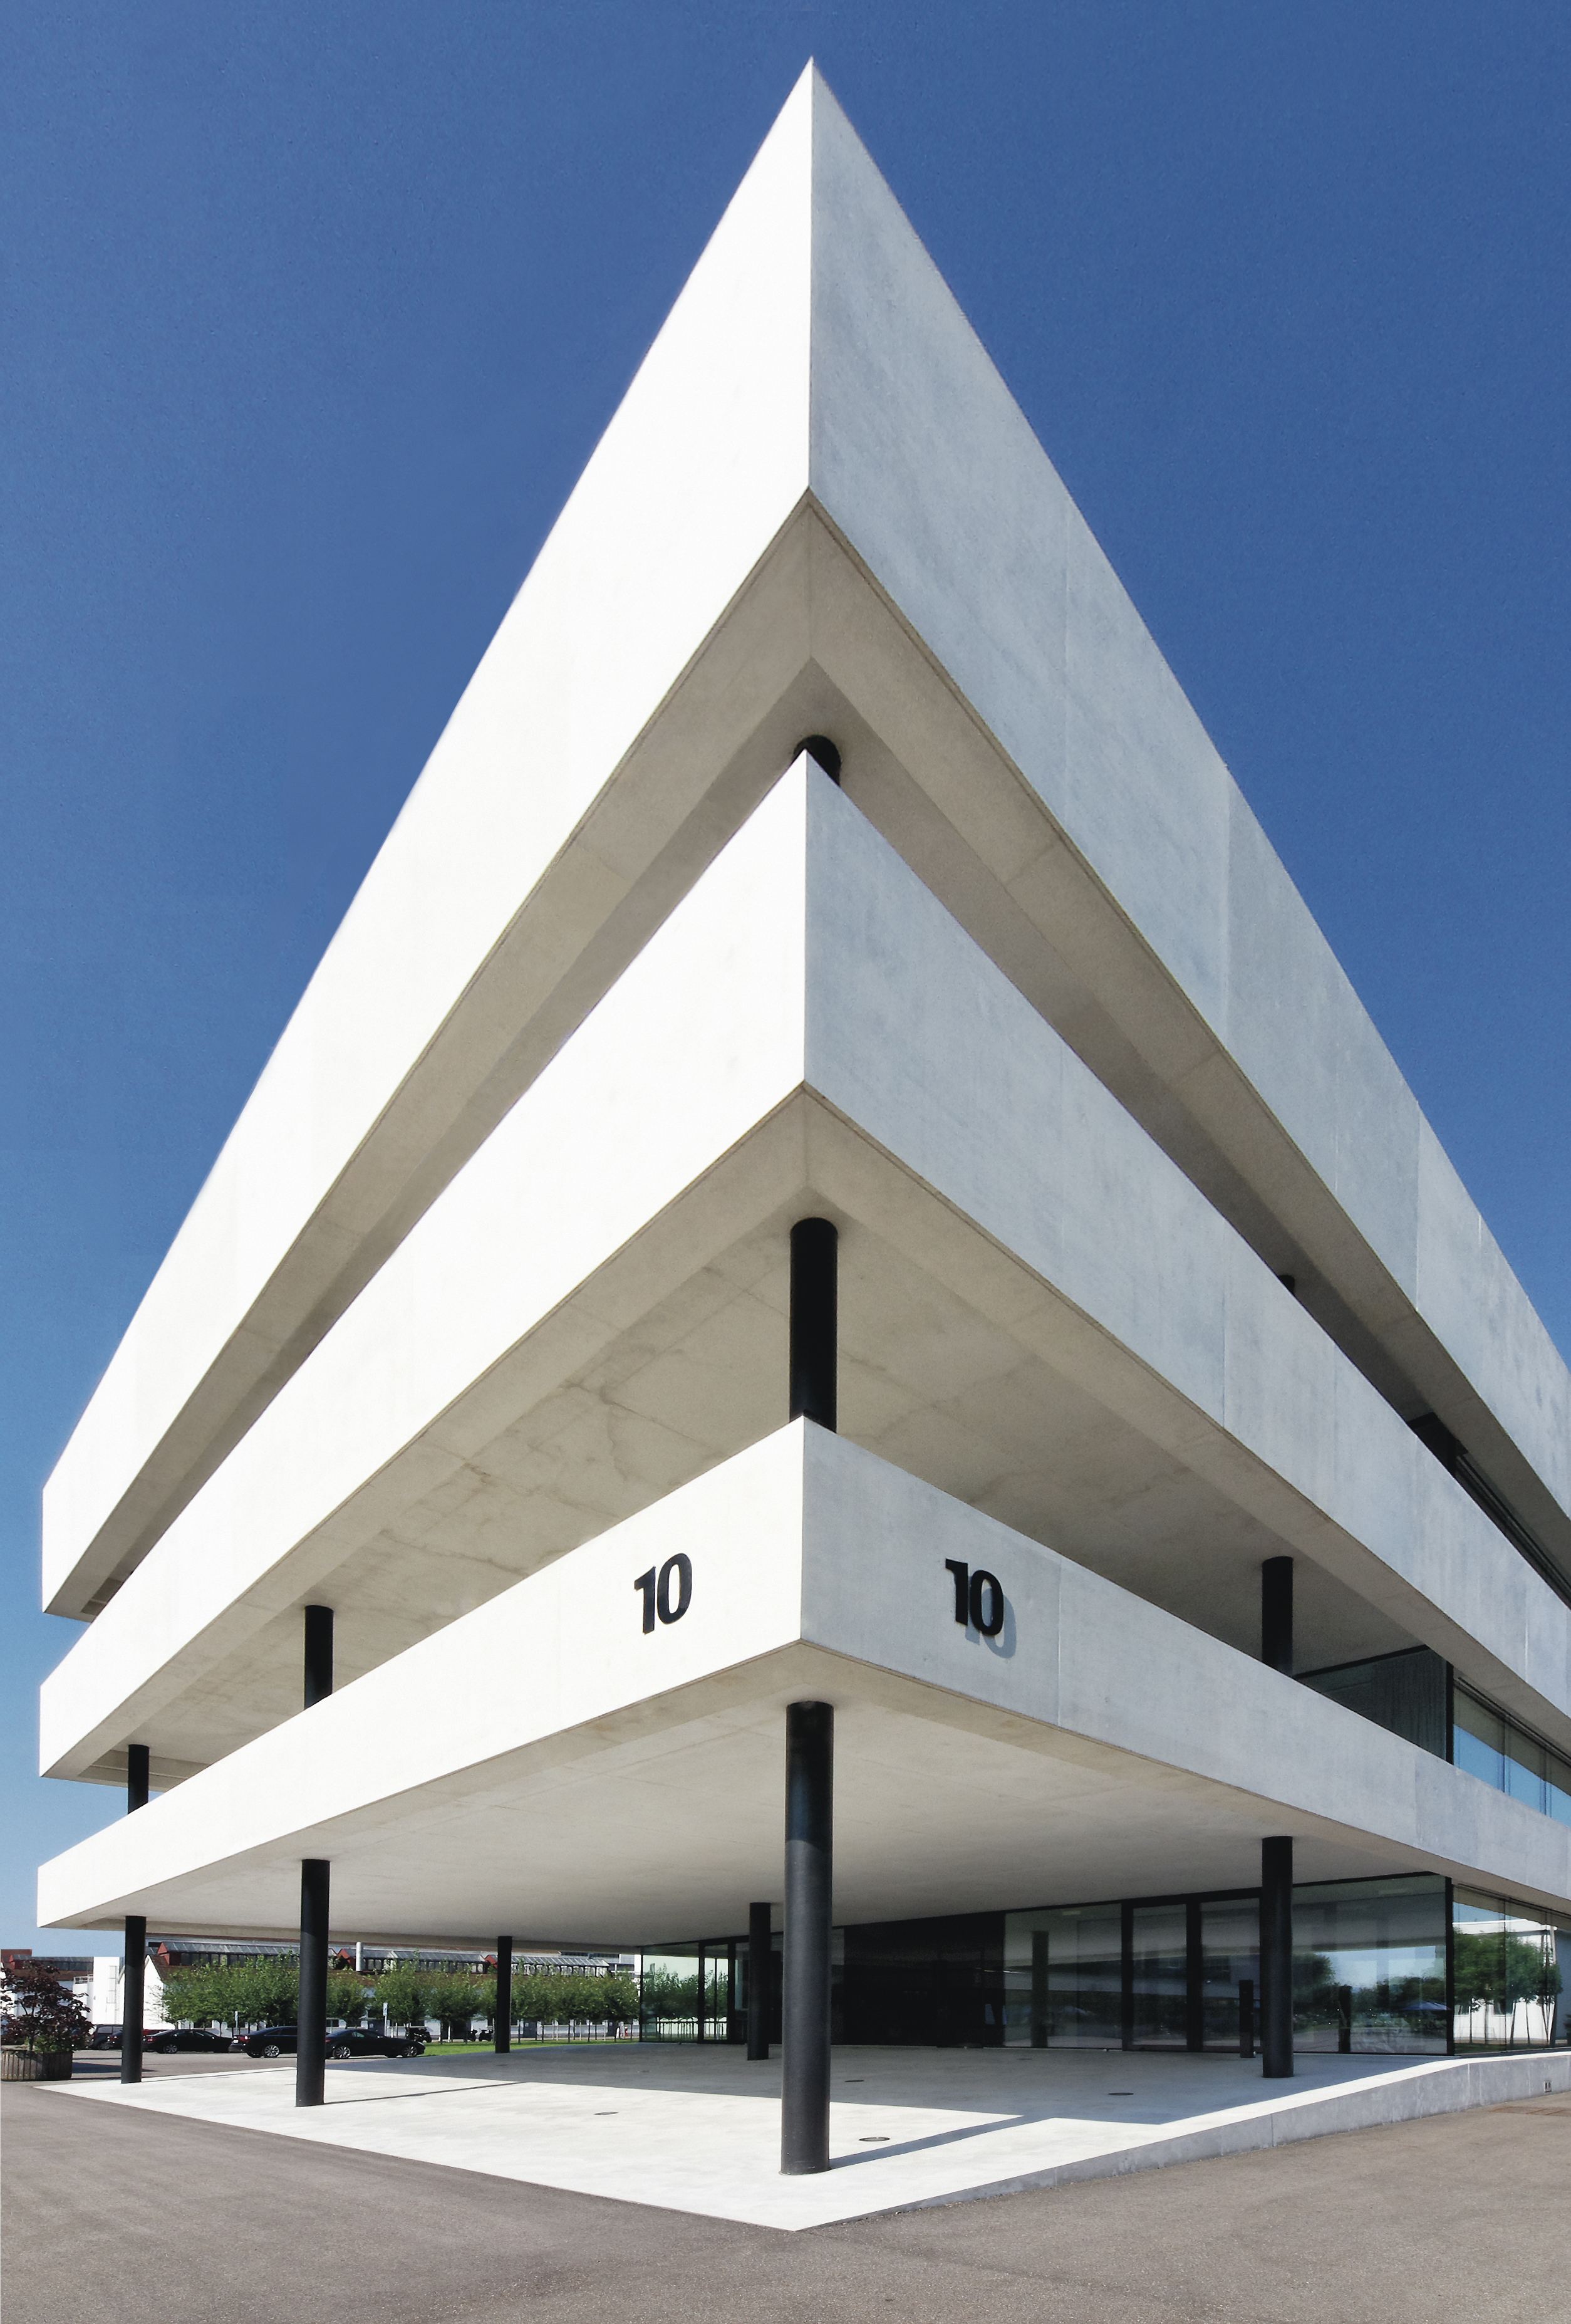 Roche Pharma Building 10, Grenzach